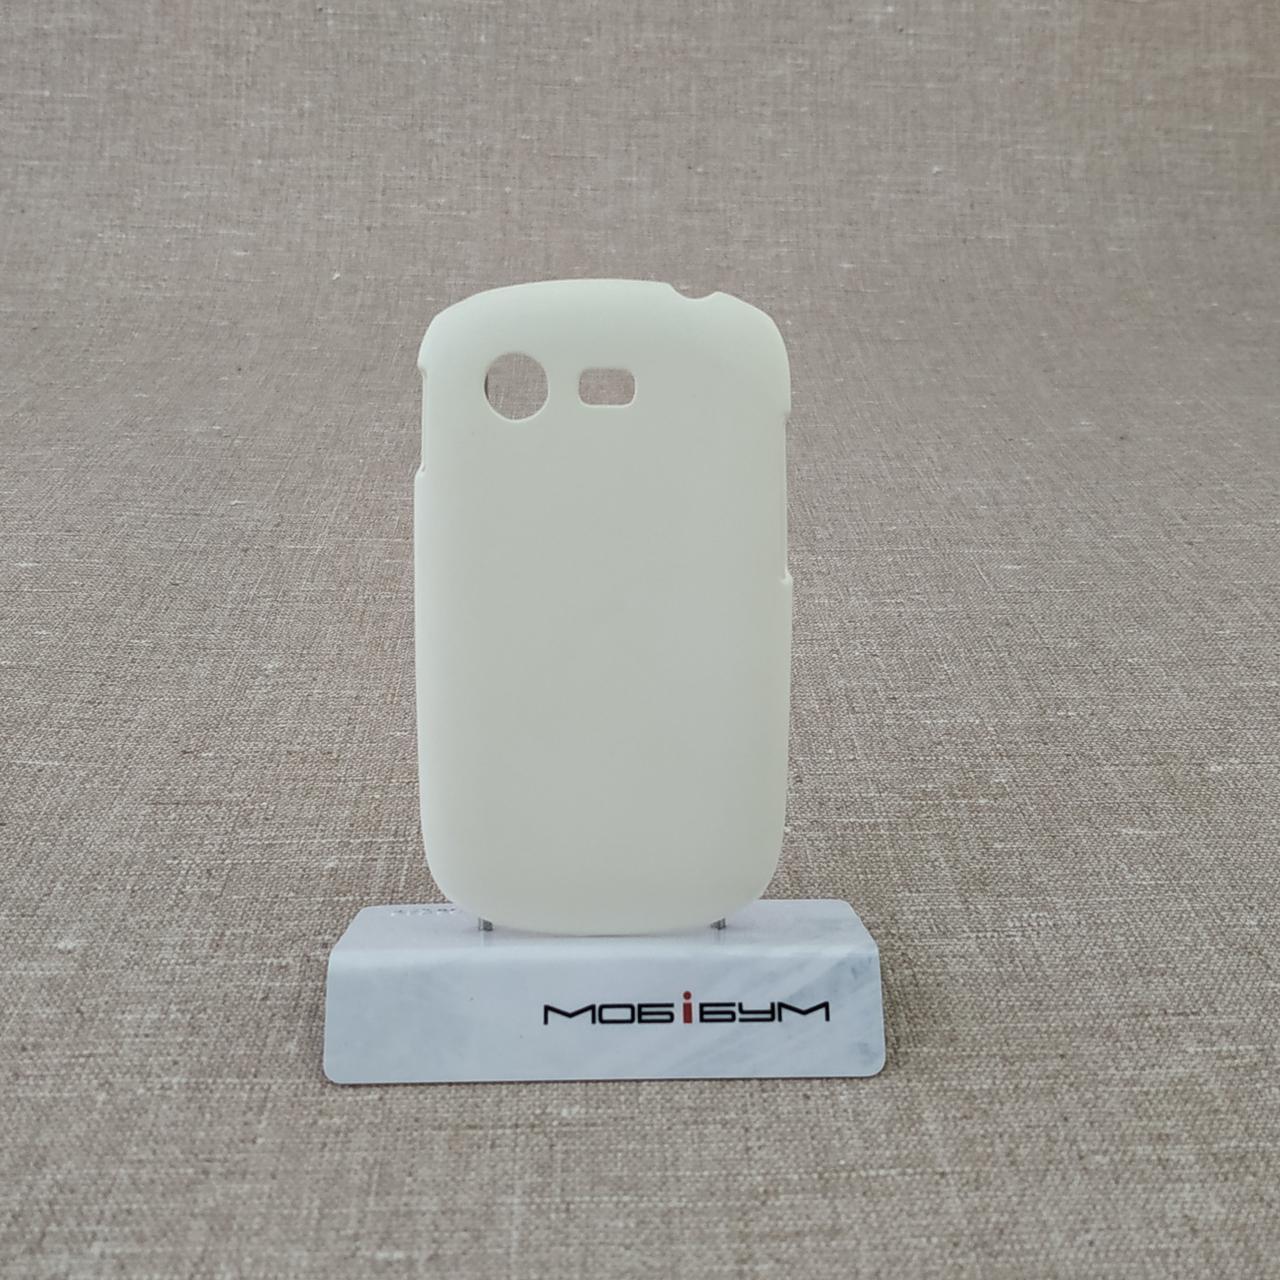 Чехол Essence Harrison Samsung S5282 white (BCSSS5282P4WH) EAN/UPC: 6958971502716